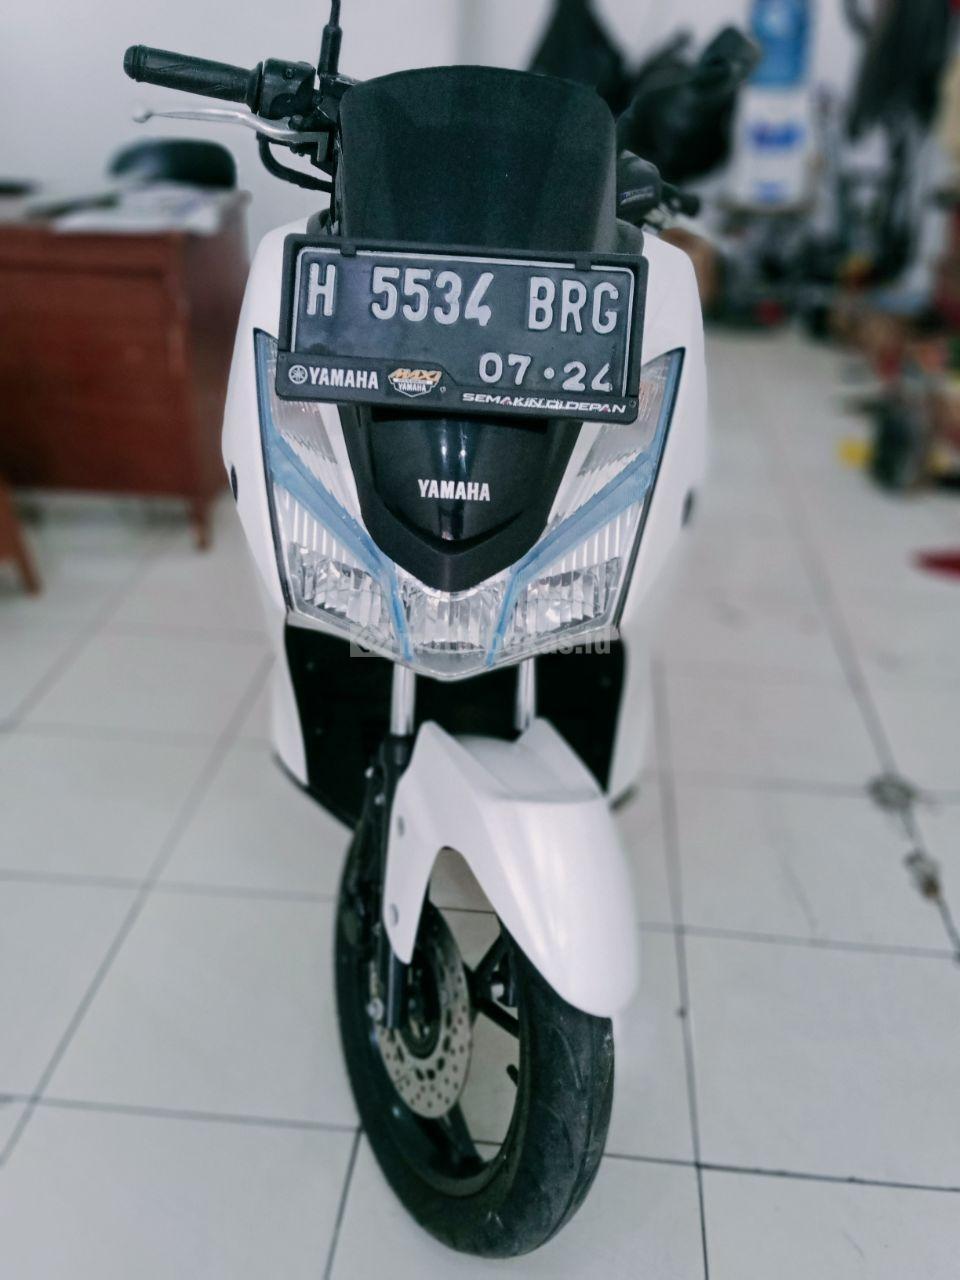 YAMAHA LEXI FI 956 motorbekas.id